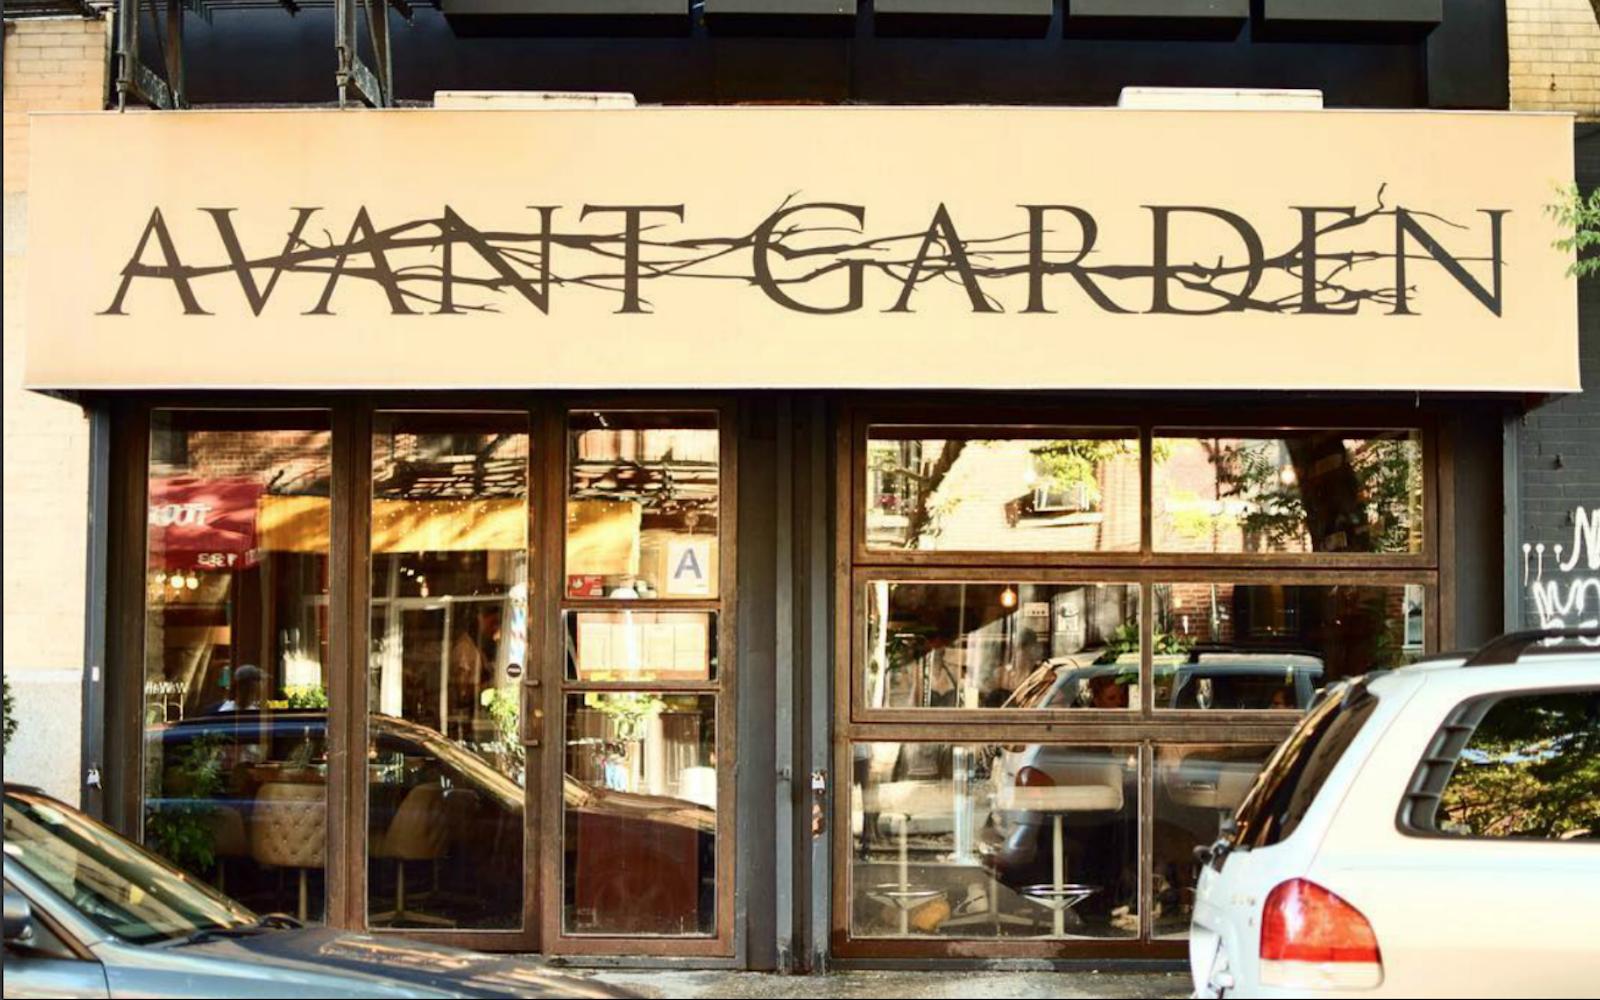 Famed Vegan Restaurant Avant Garden To Open New Location In Brooklyn Vegan Restaurants Avant Garden Nyc East Village Nyc